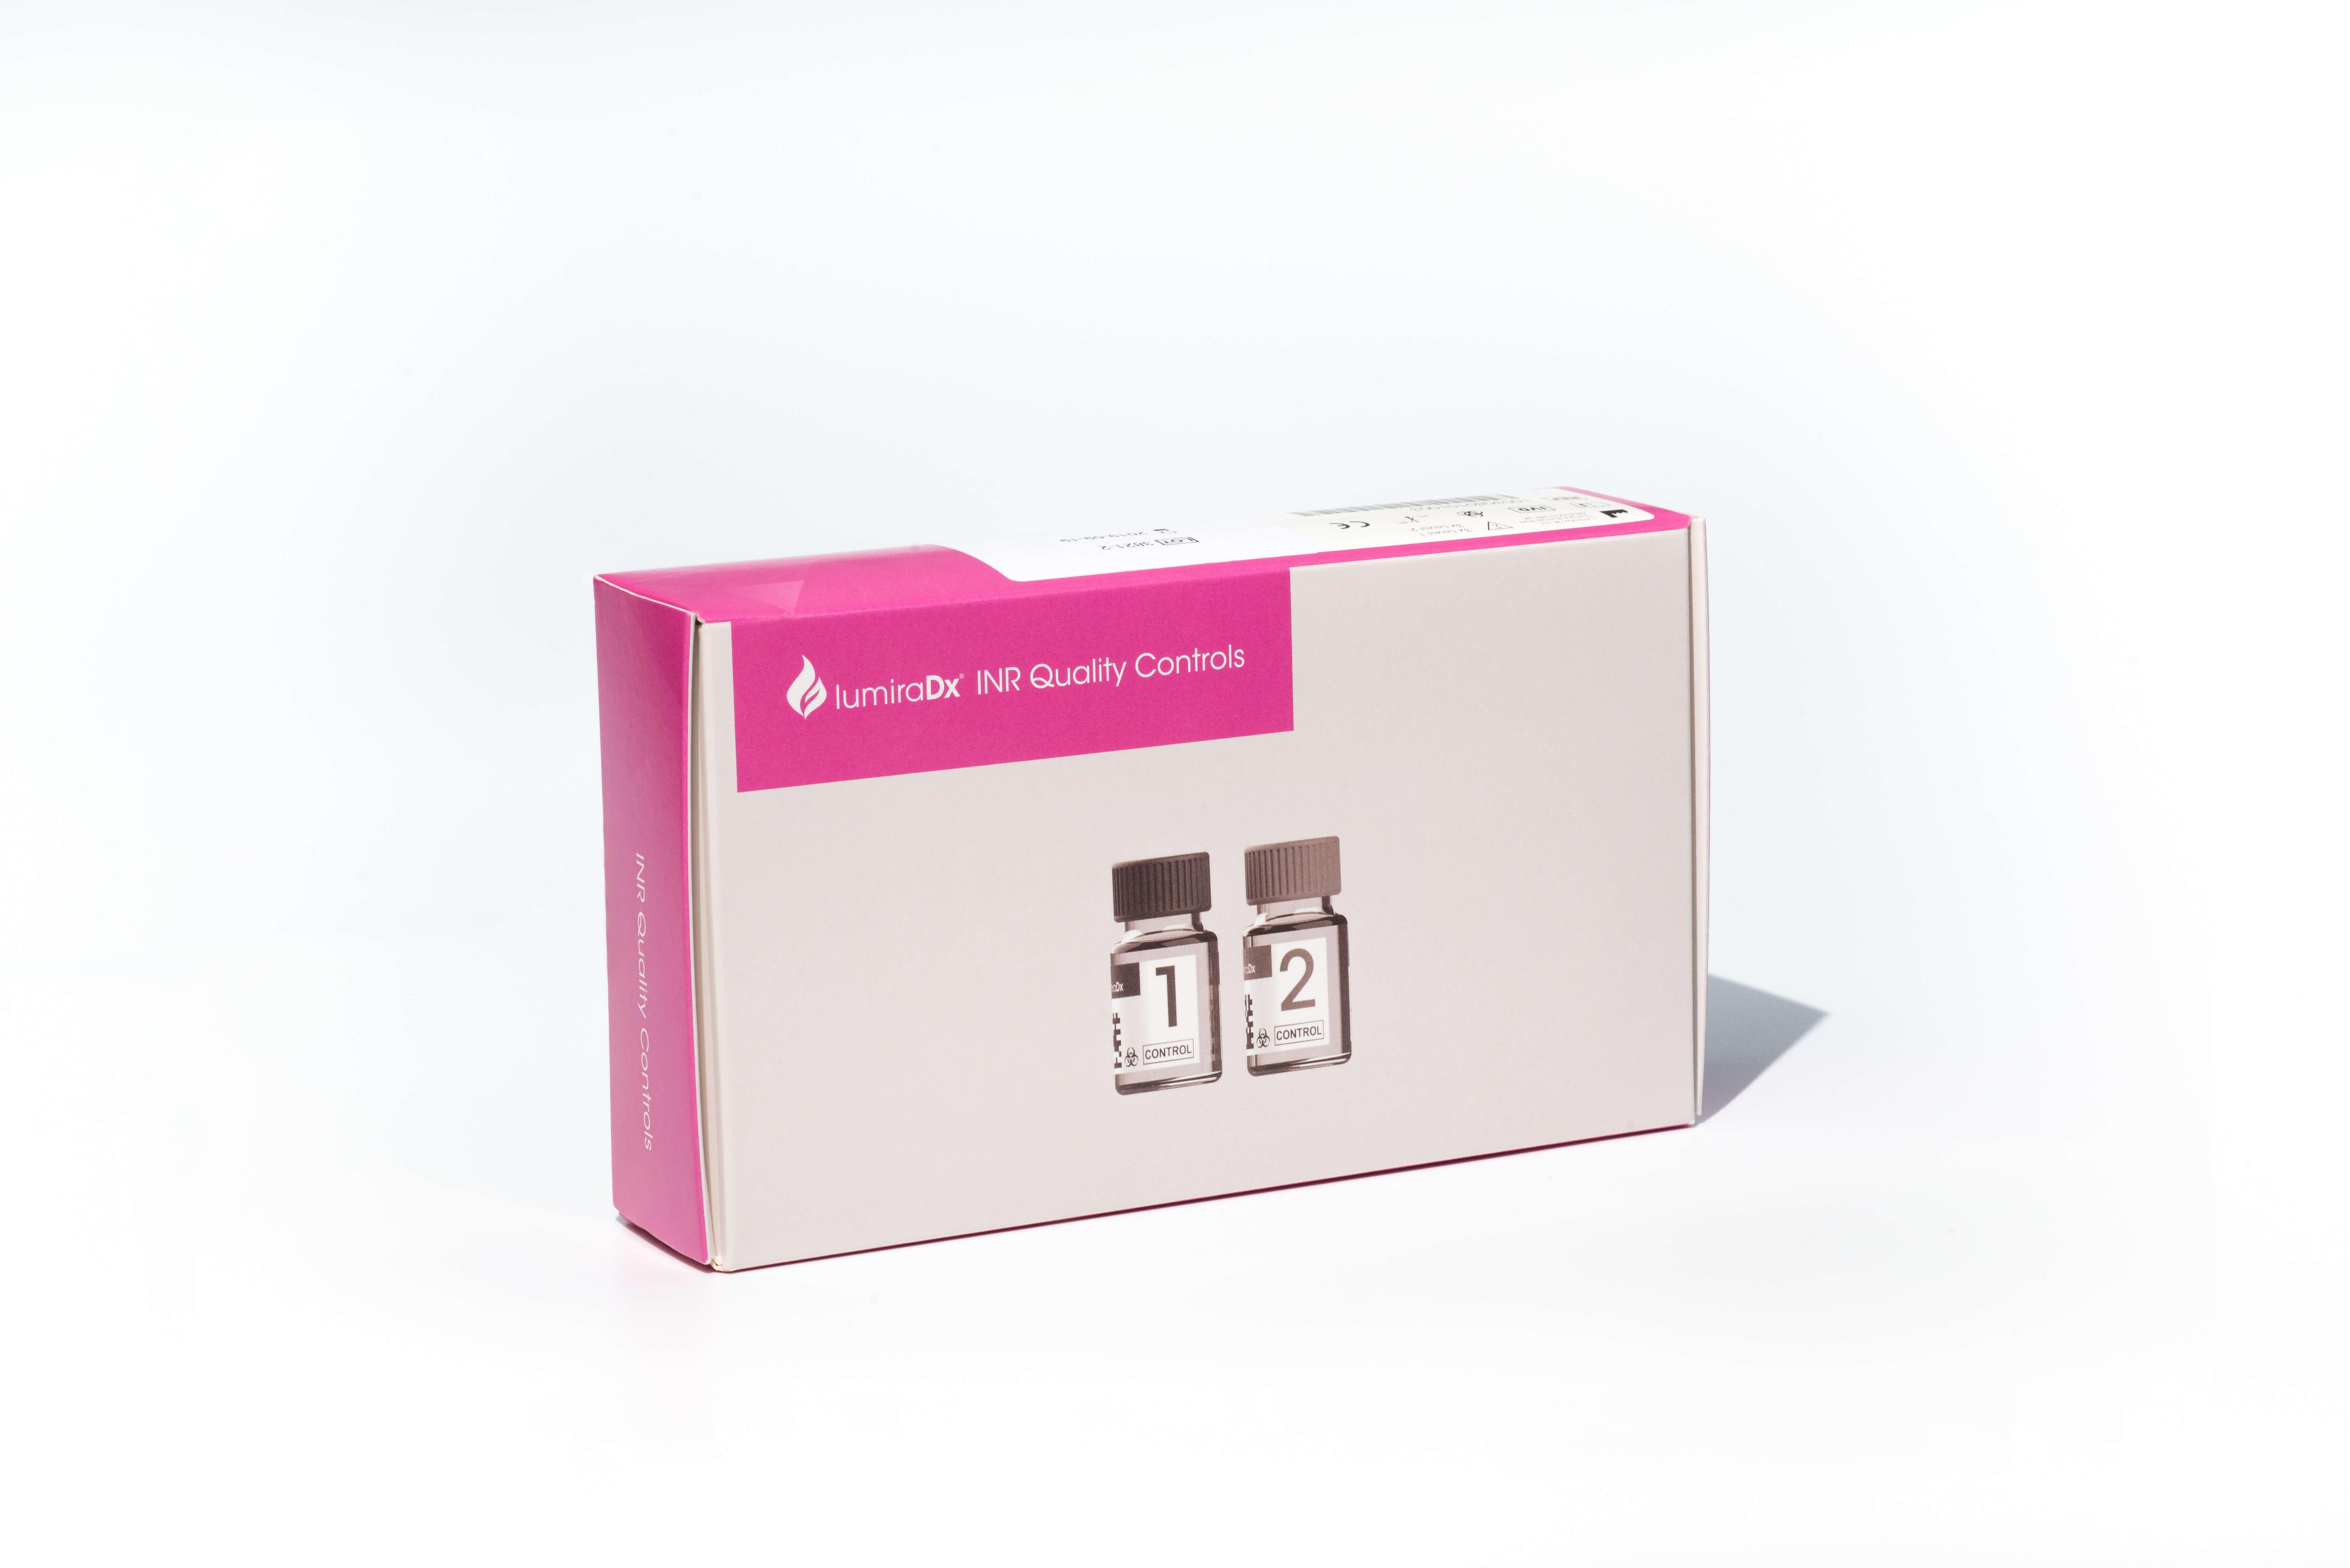 LumiraDx INR Controls pack.jpg